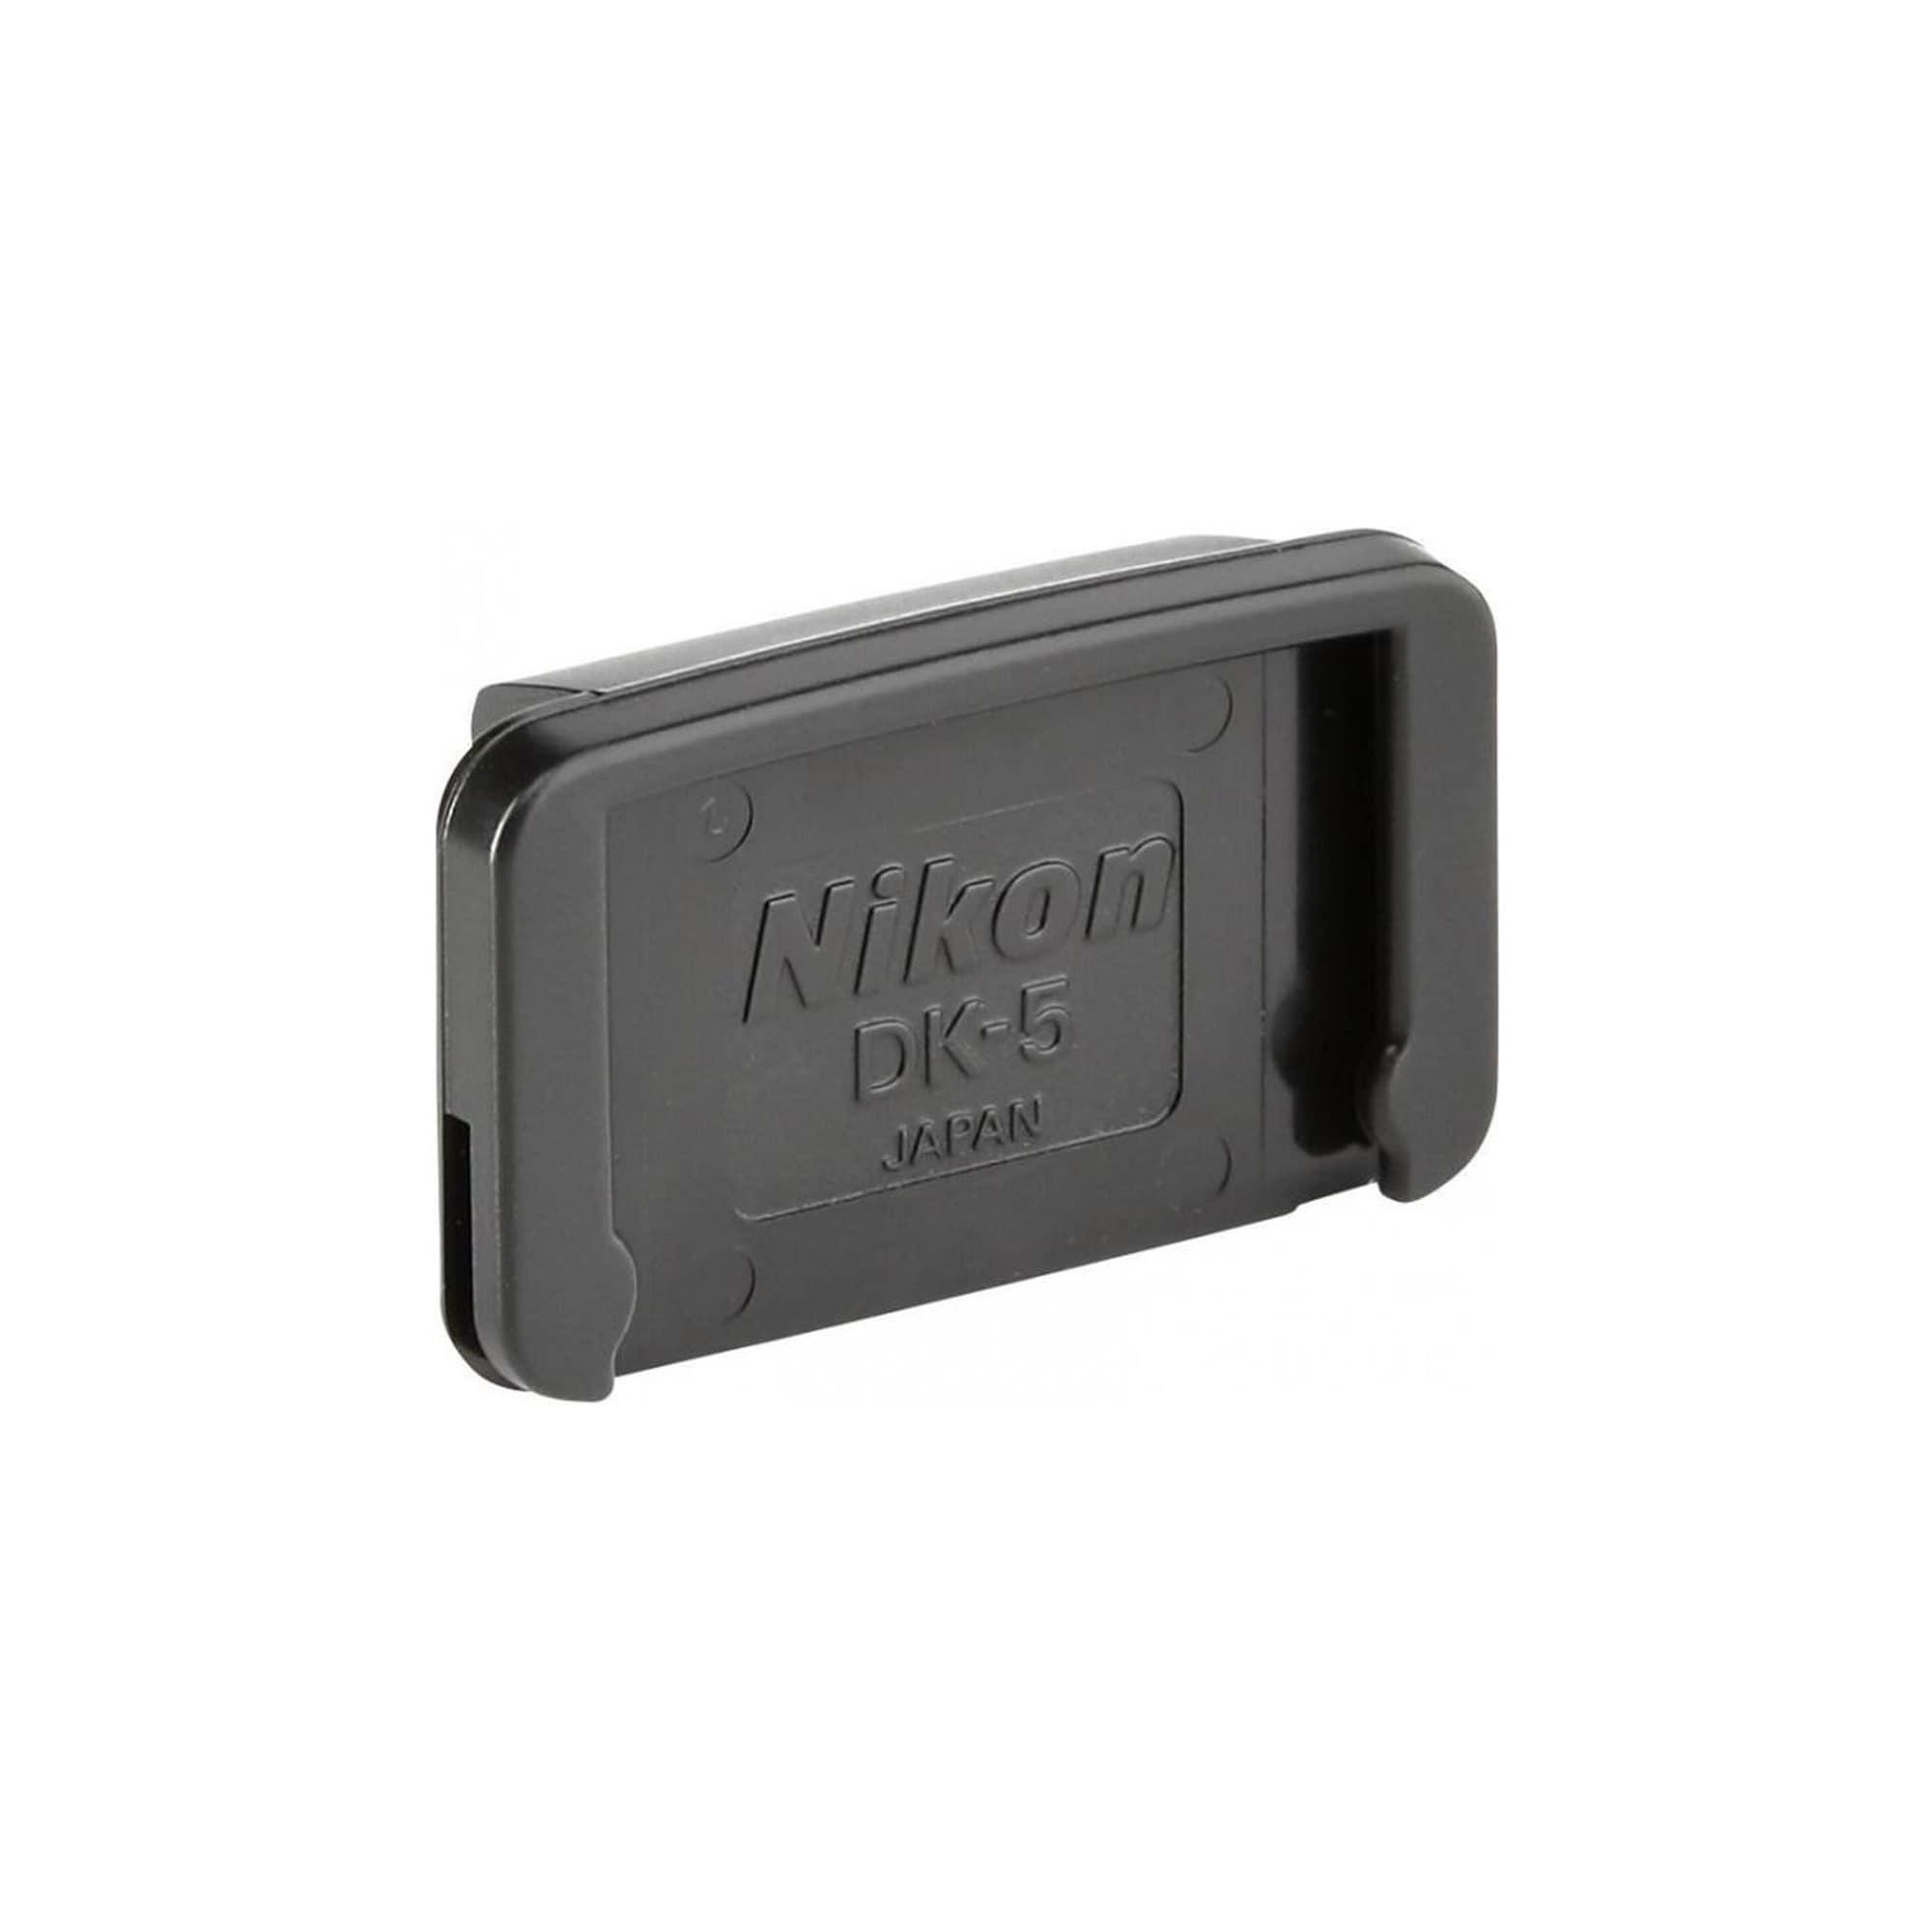 Nikon DK-5 Skydd